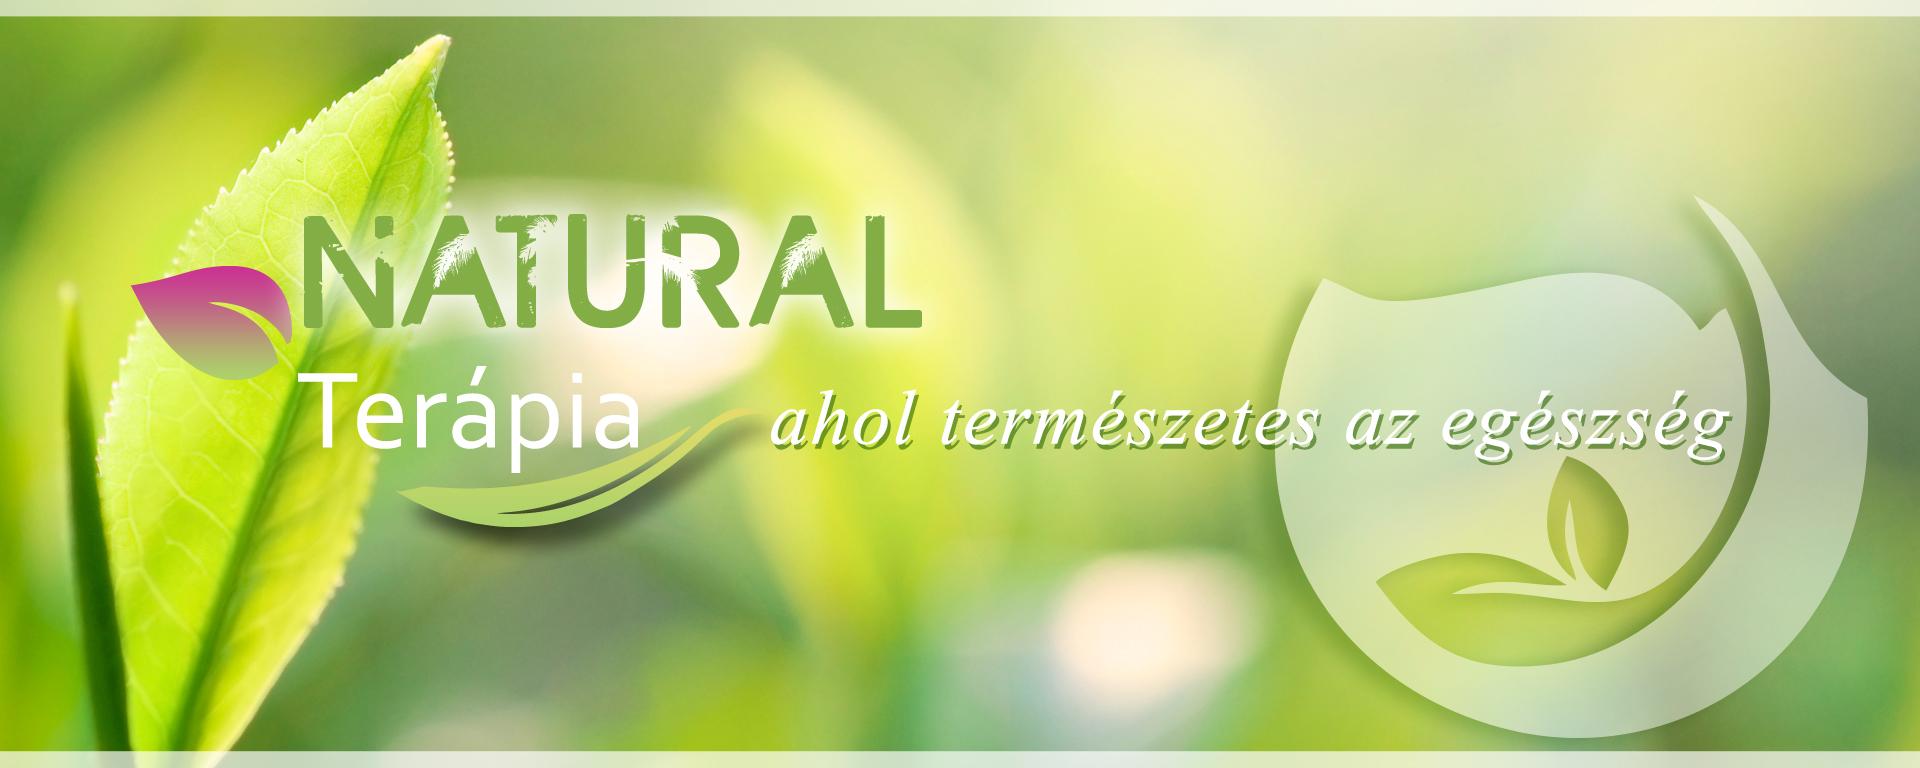 Natural terapia